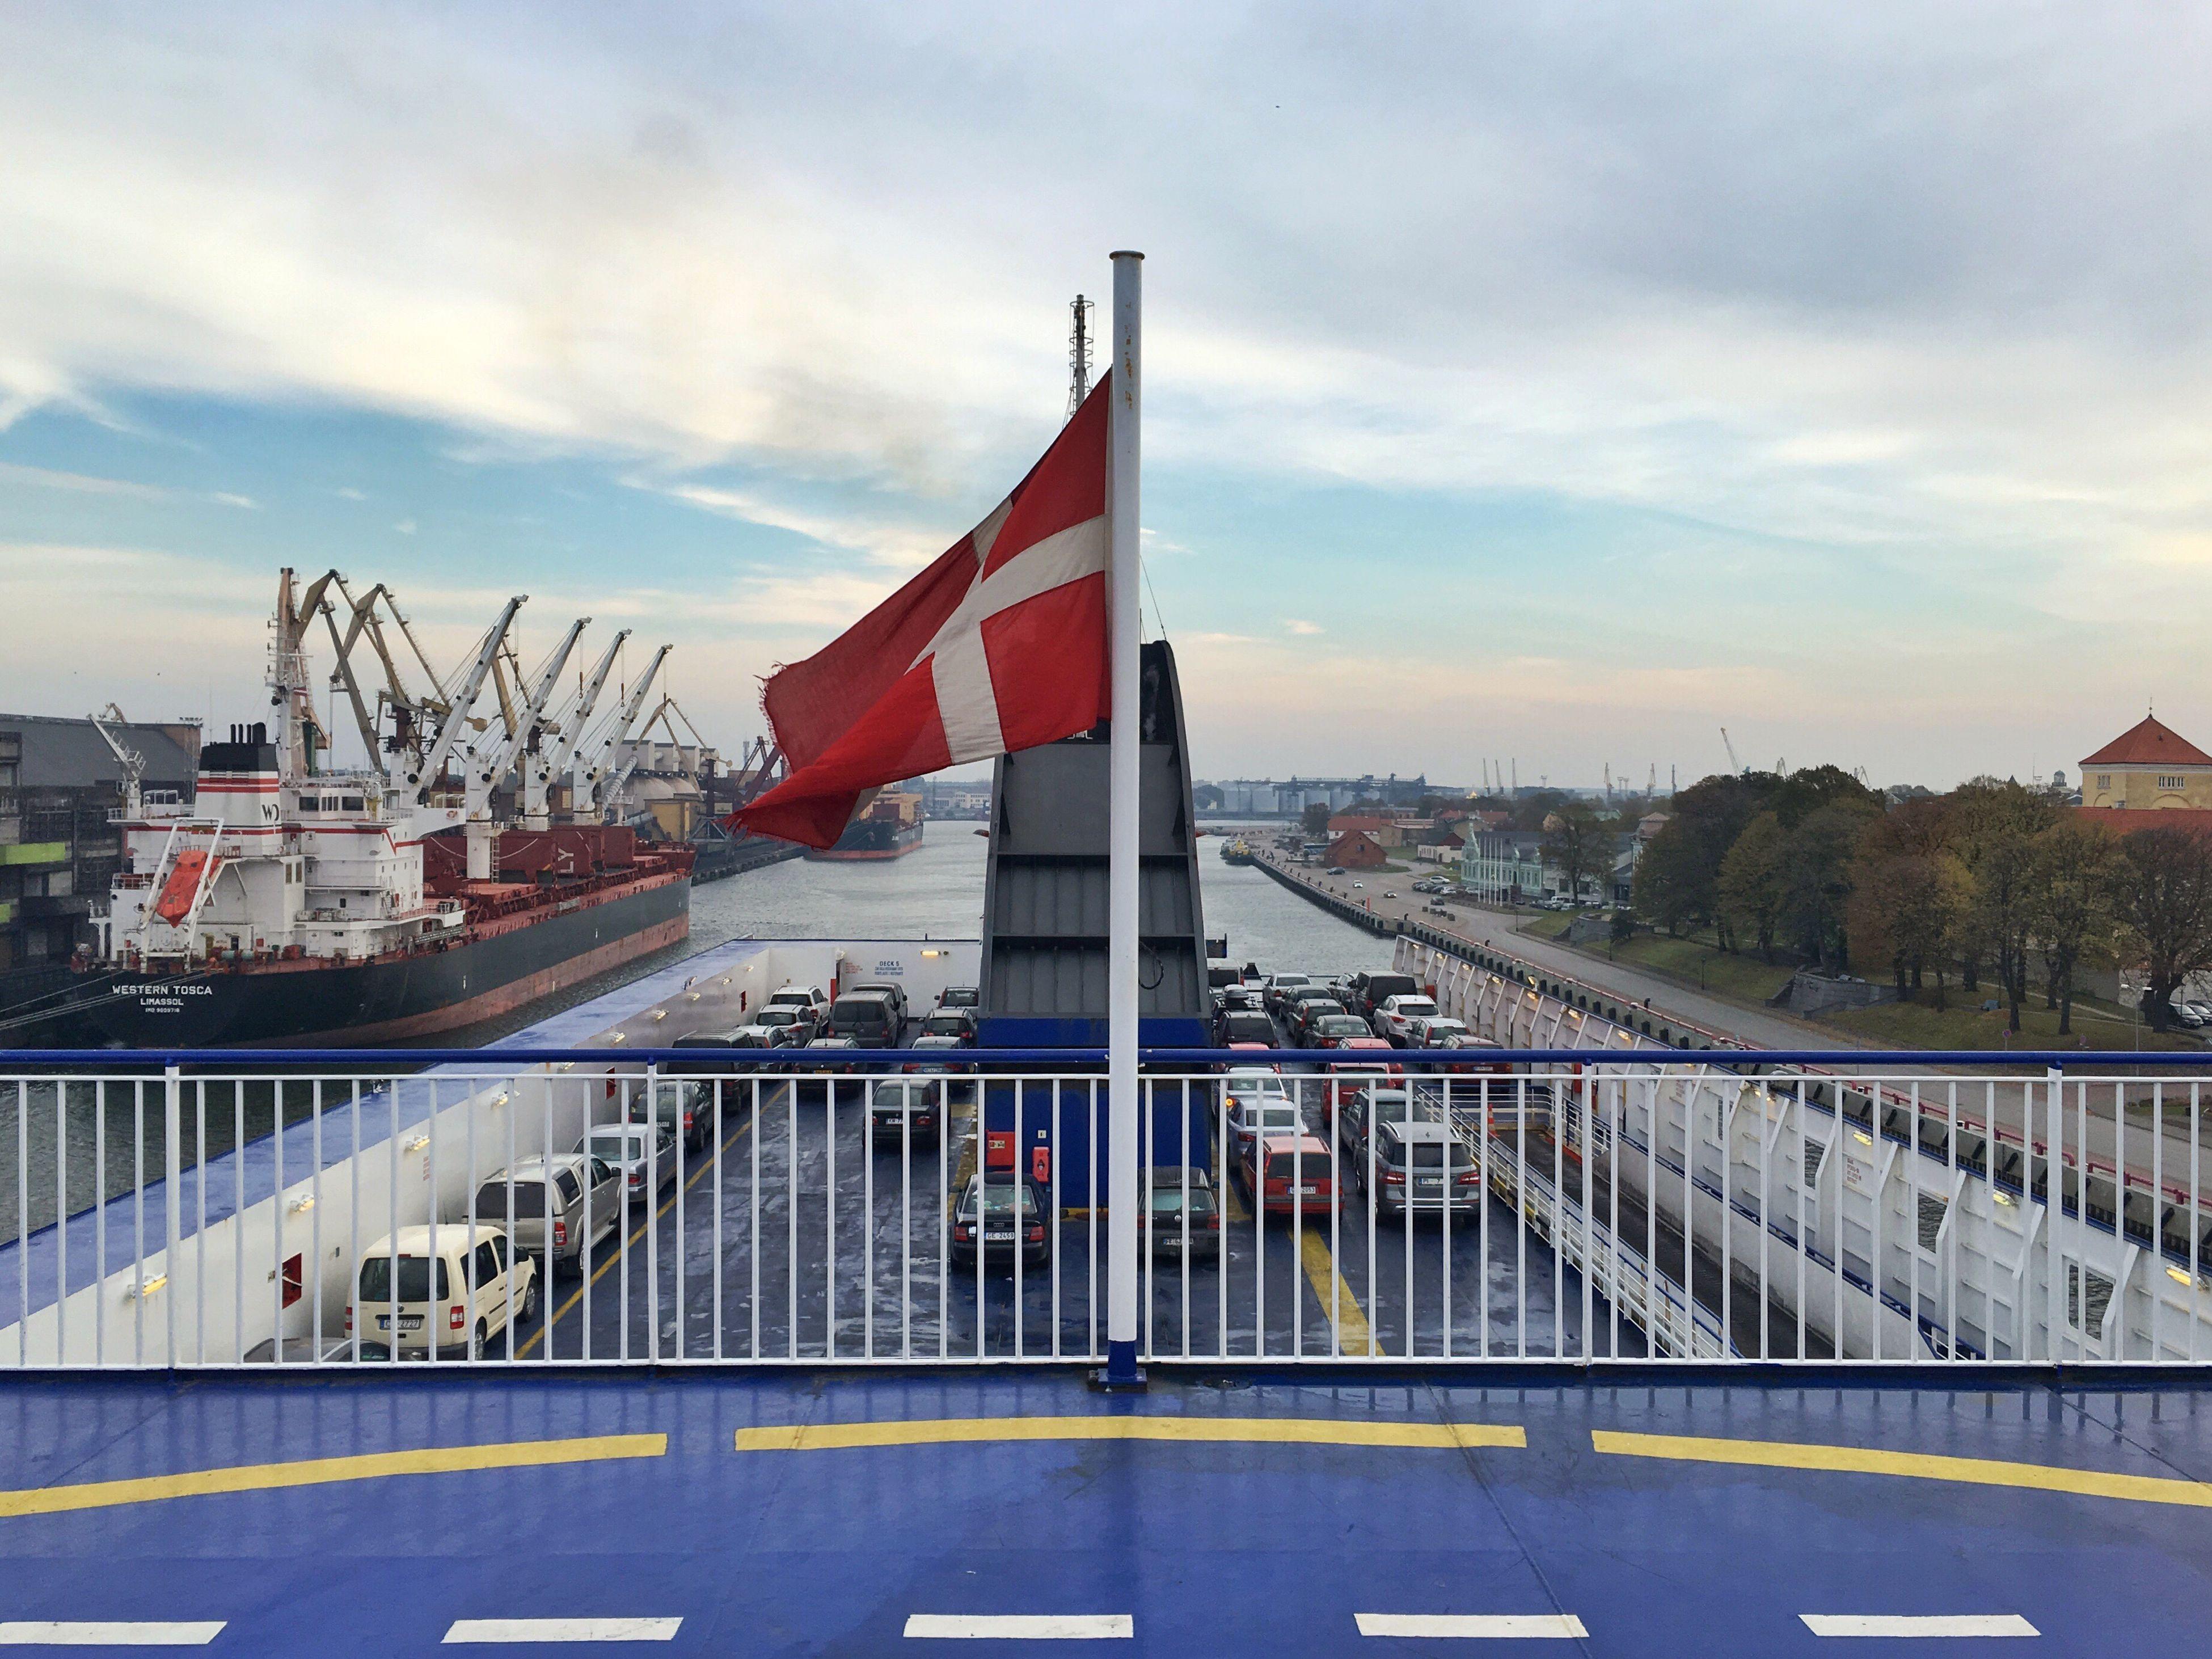 patriotism, flag, sky, architecture, cloud - sky, built structure, pride, bridge - man made structure, no people, outdoors, day, connection, suspension bridge